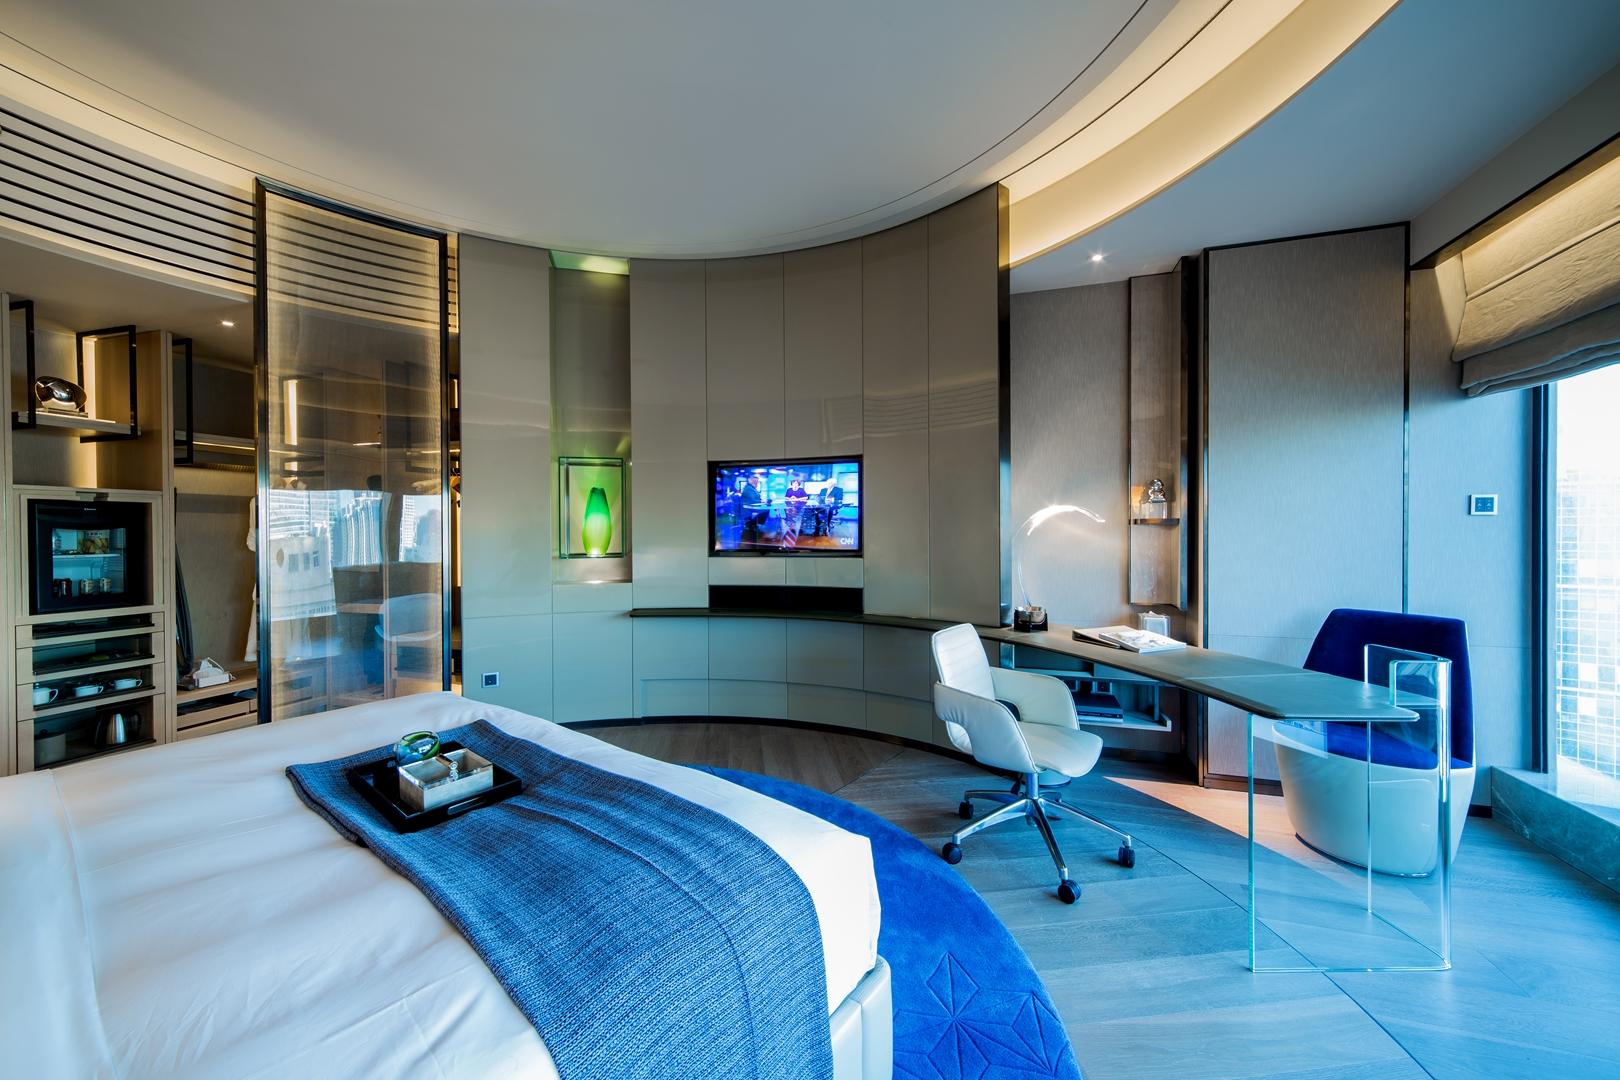 09 Standard Room (Copy)